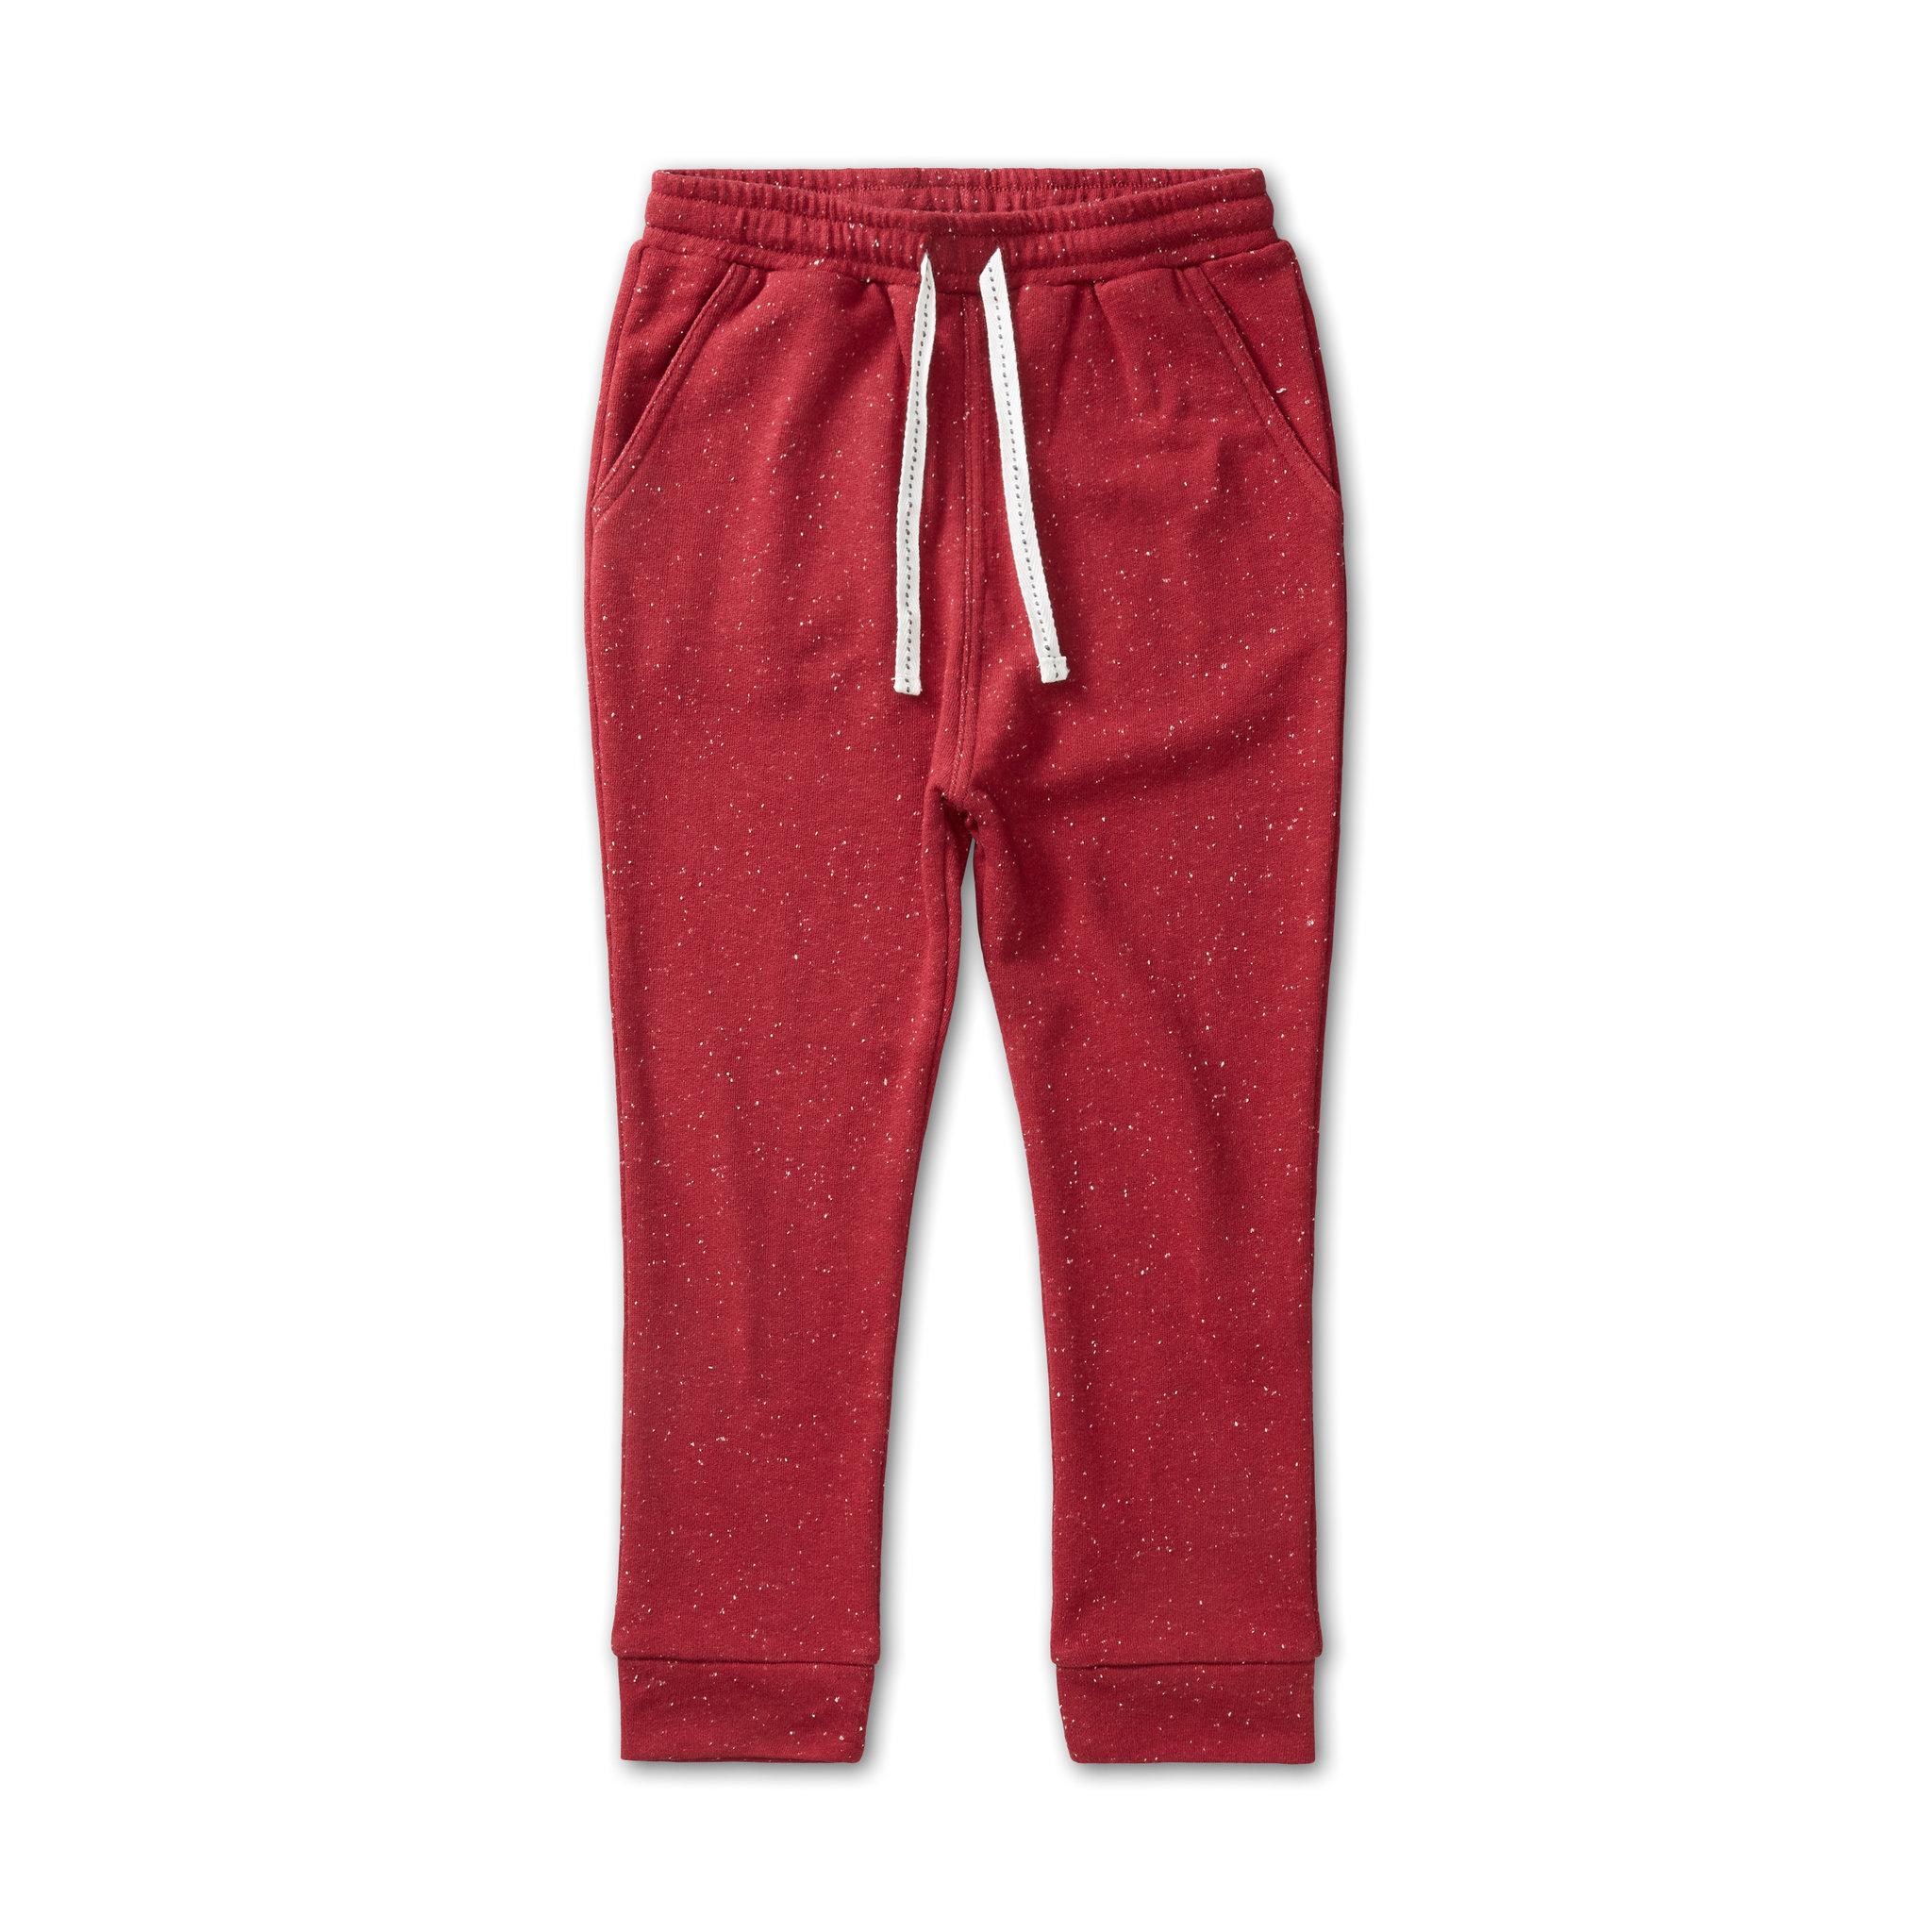 Sweatpant Enfärgad - Byxor   shorts - Köp online på åhlens.se! 0e4c0ed34052c